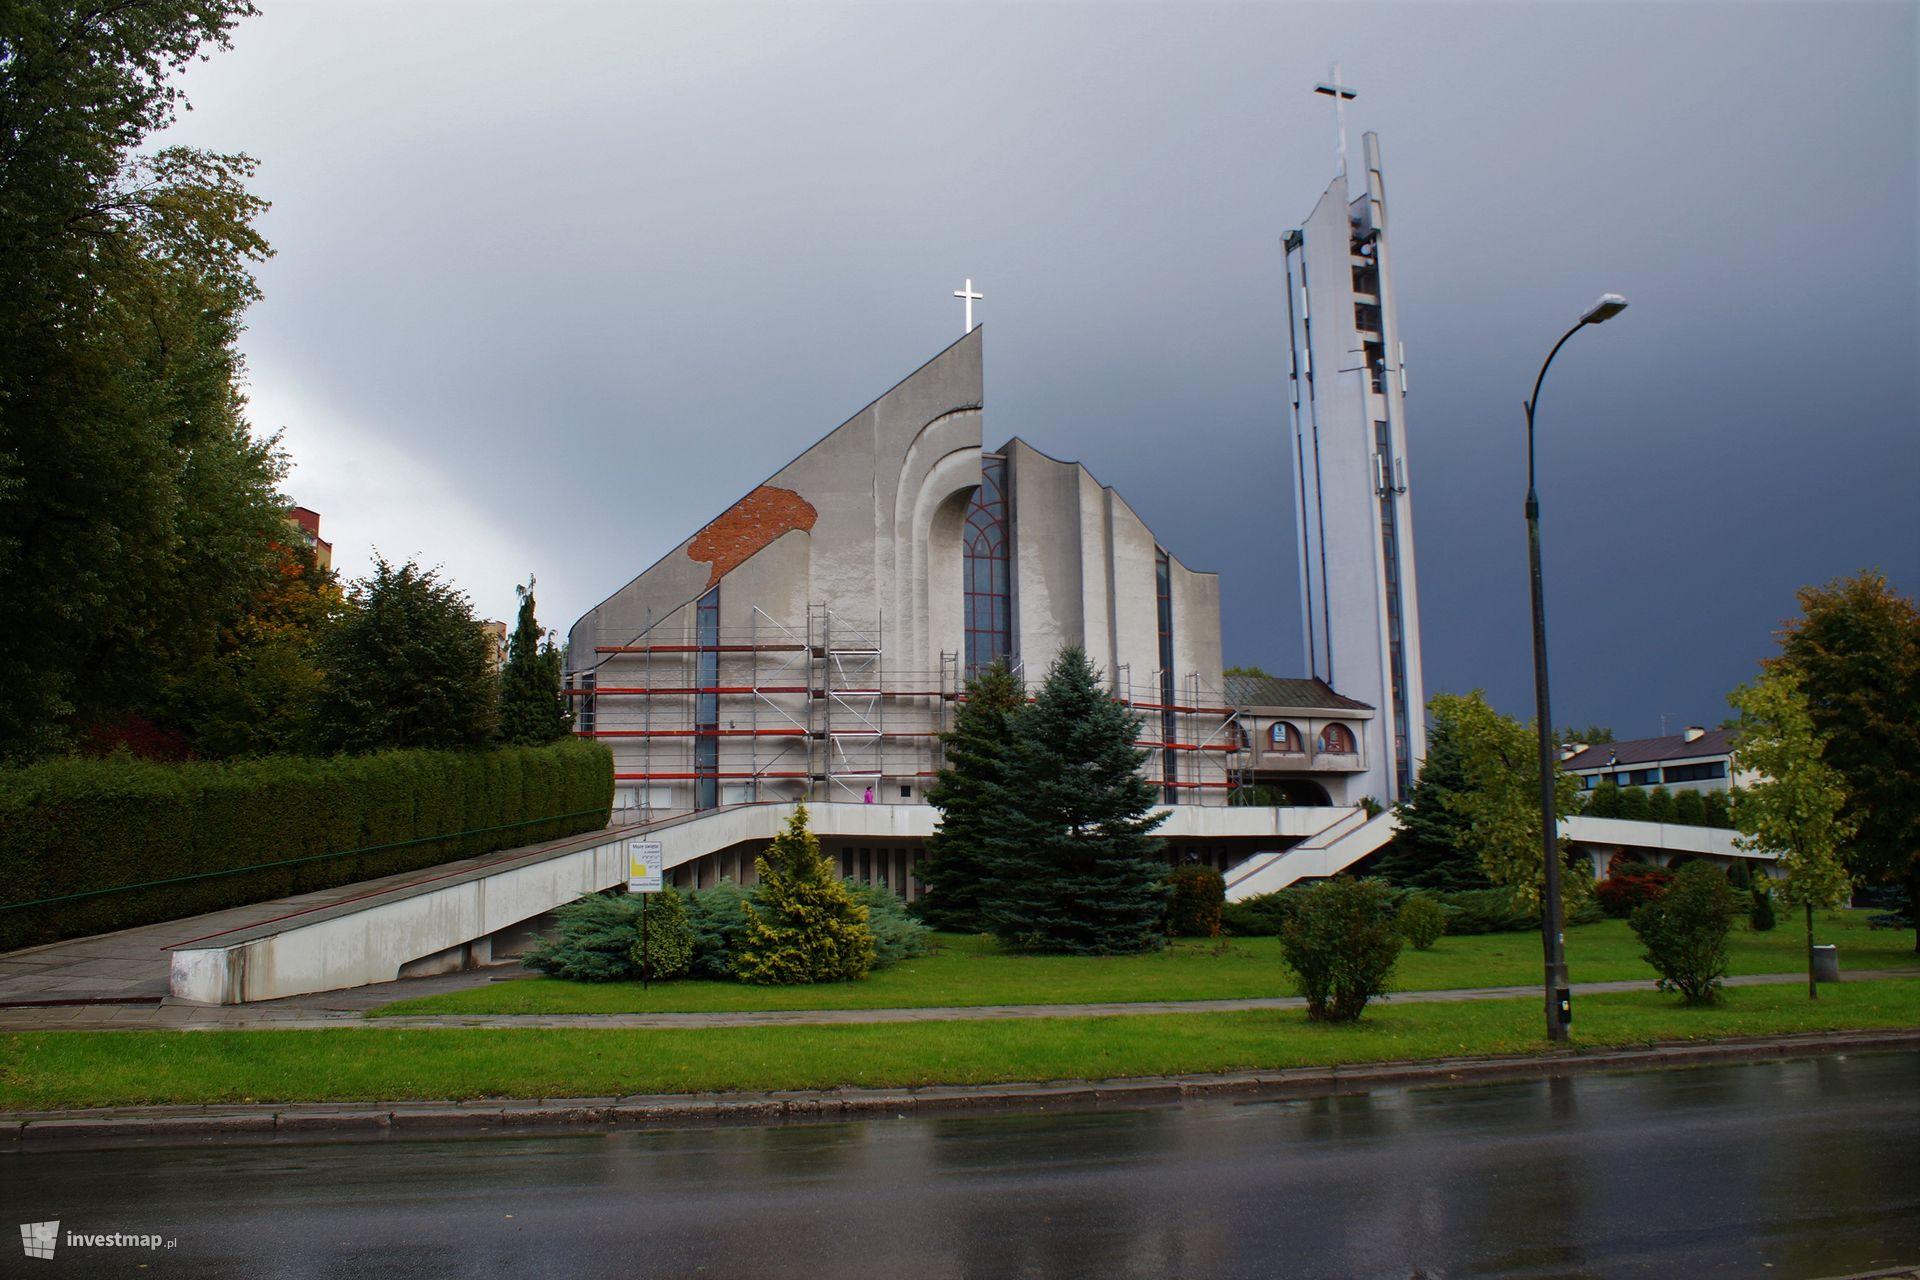 Kościół RPWMB, os. Na Wzgórzach 1a